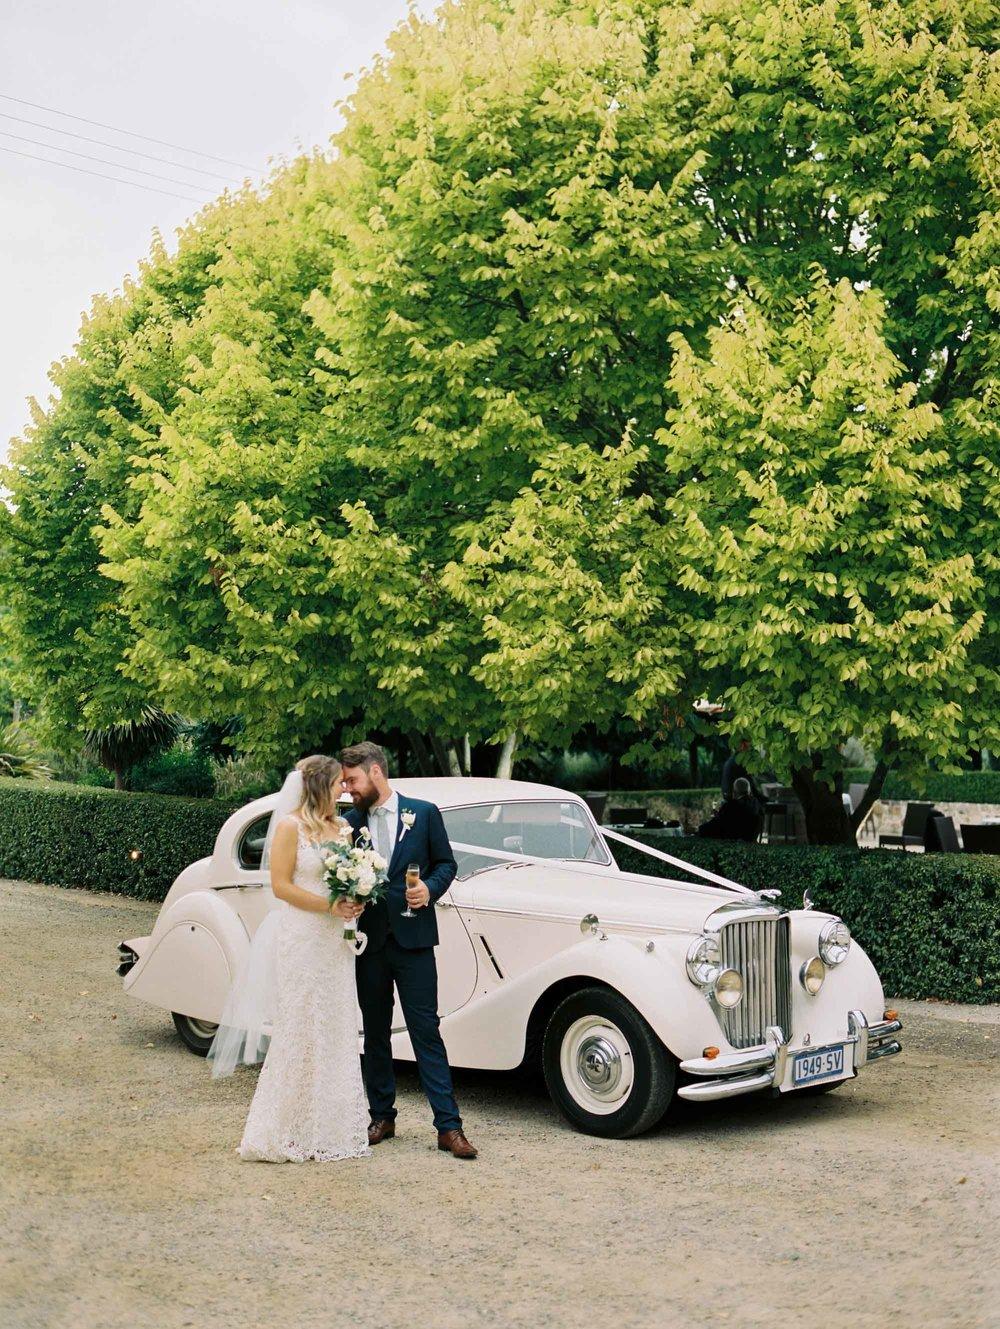 Golding-Wines-wedding-photography-072.jpg